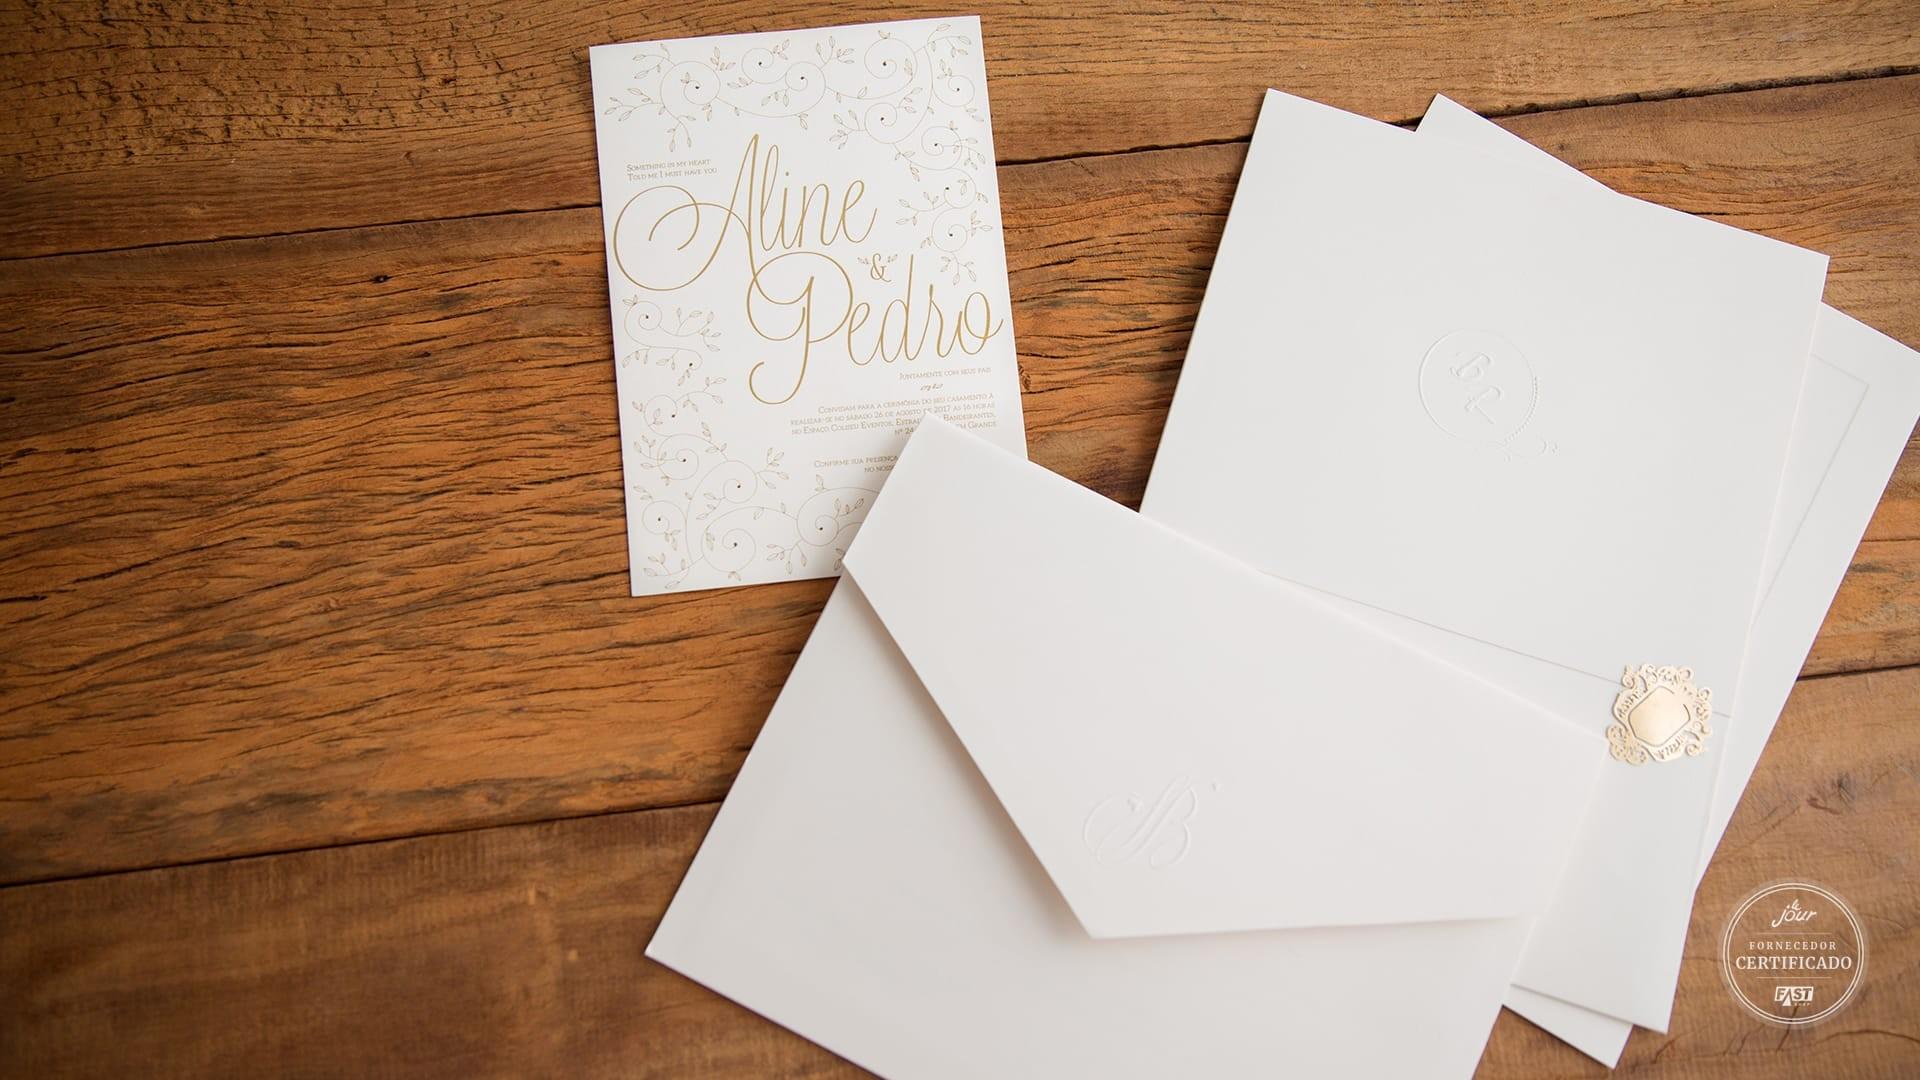 Papelaria completa para casamento: convite, envelope, save the date.